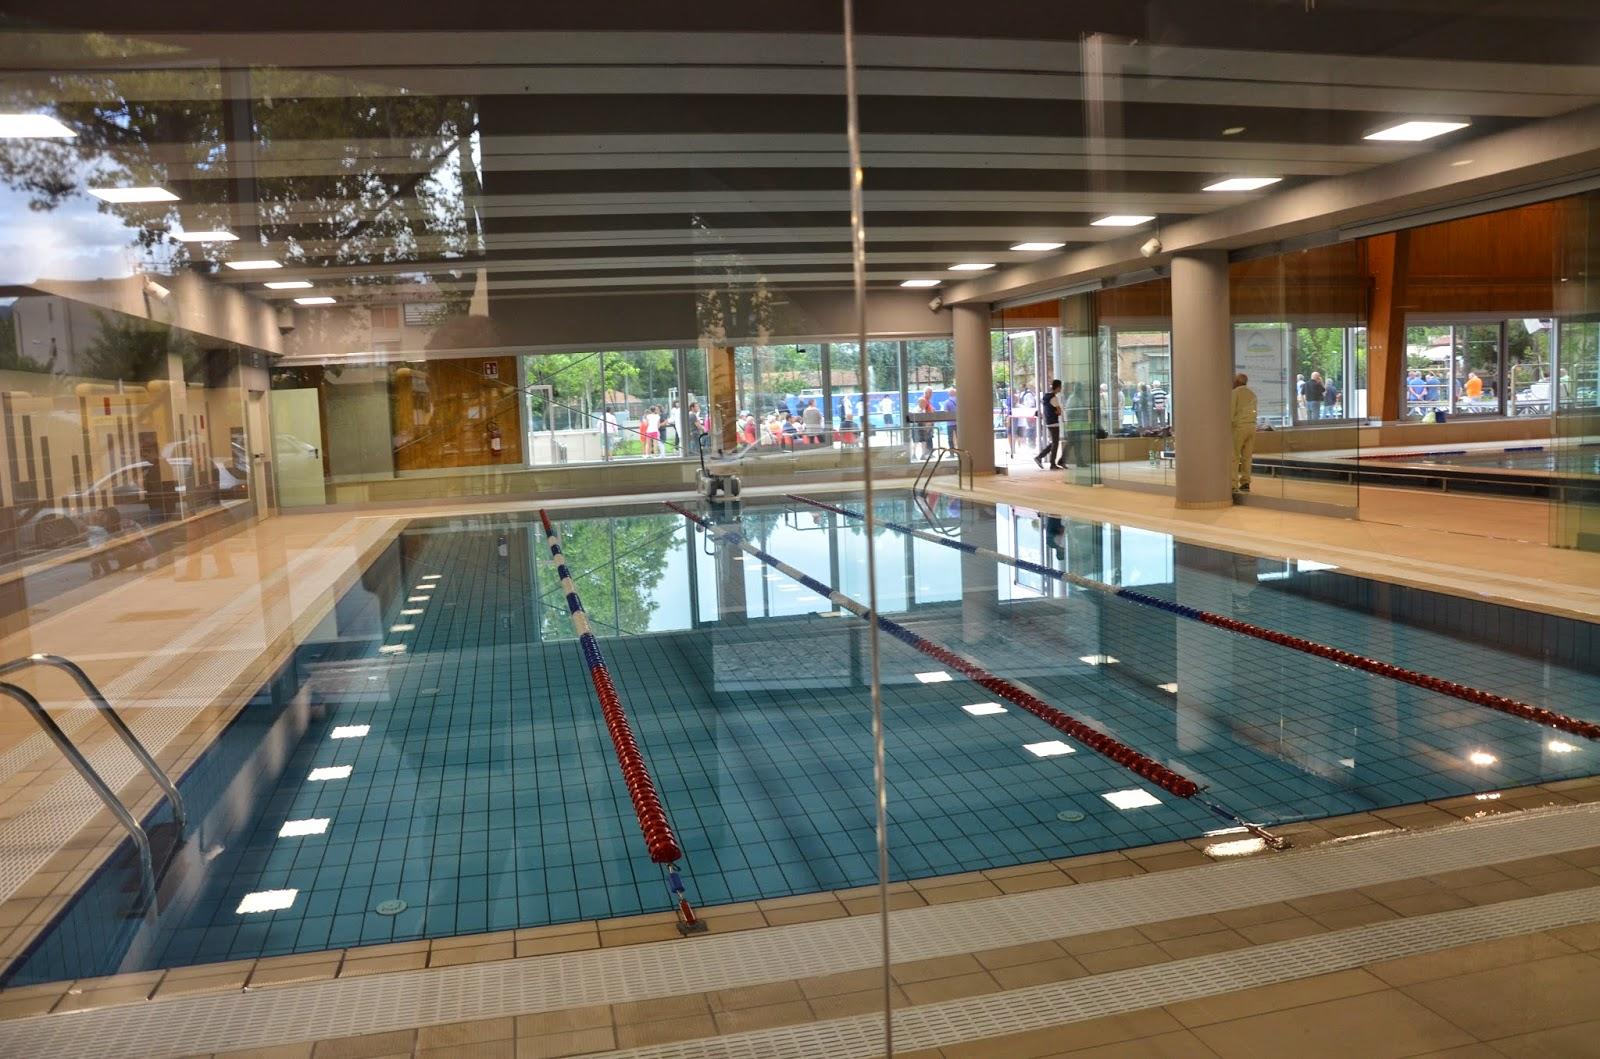 Un impianto all 39 avanguardia per le piscine dello stadio - Piscine dello stadio ...